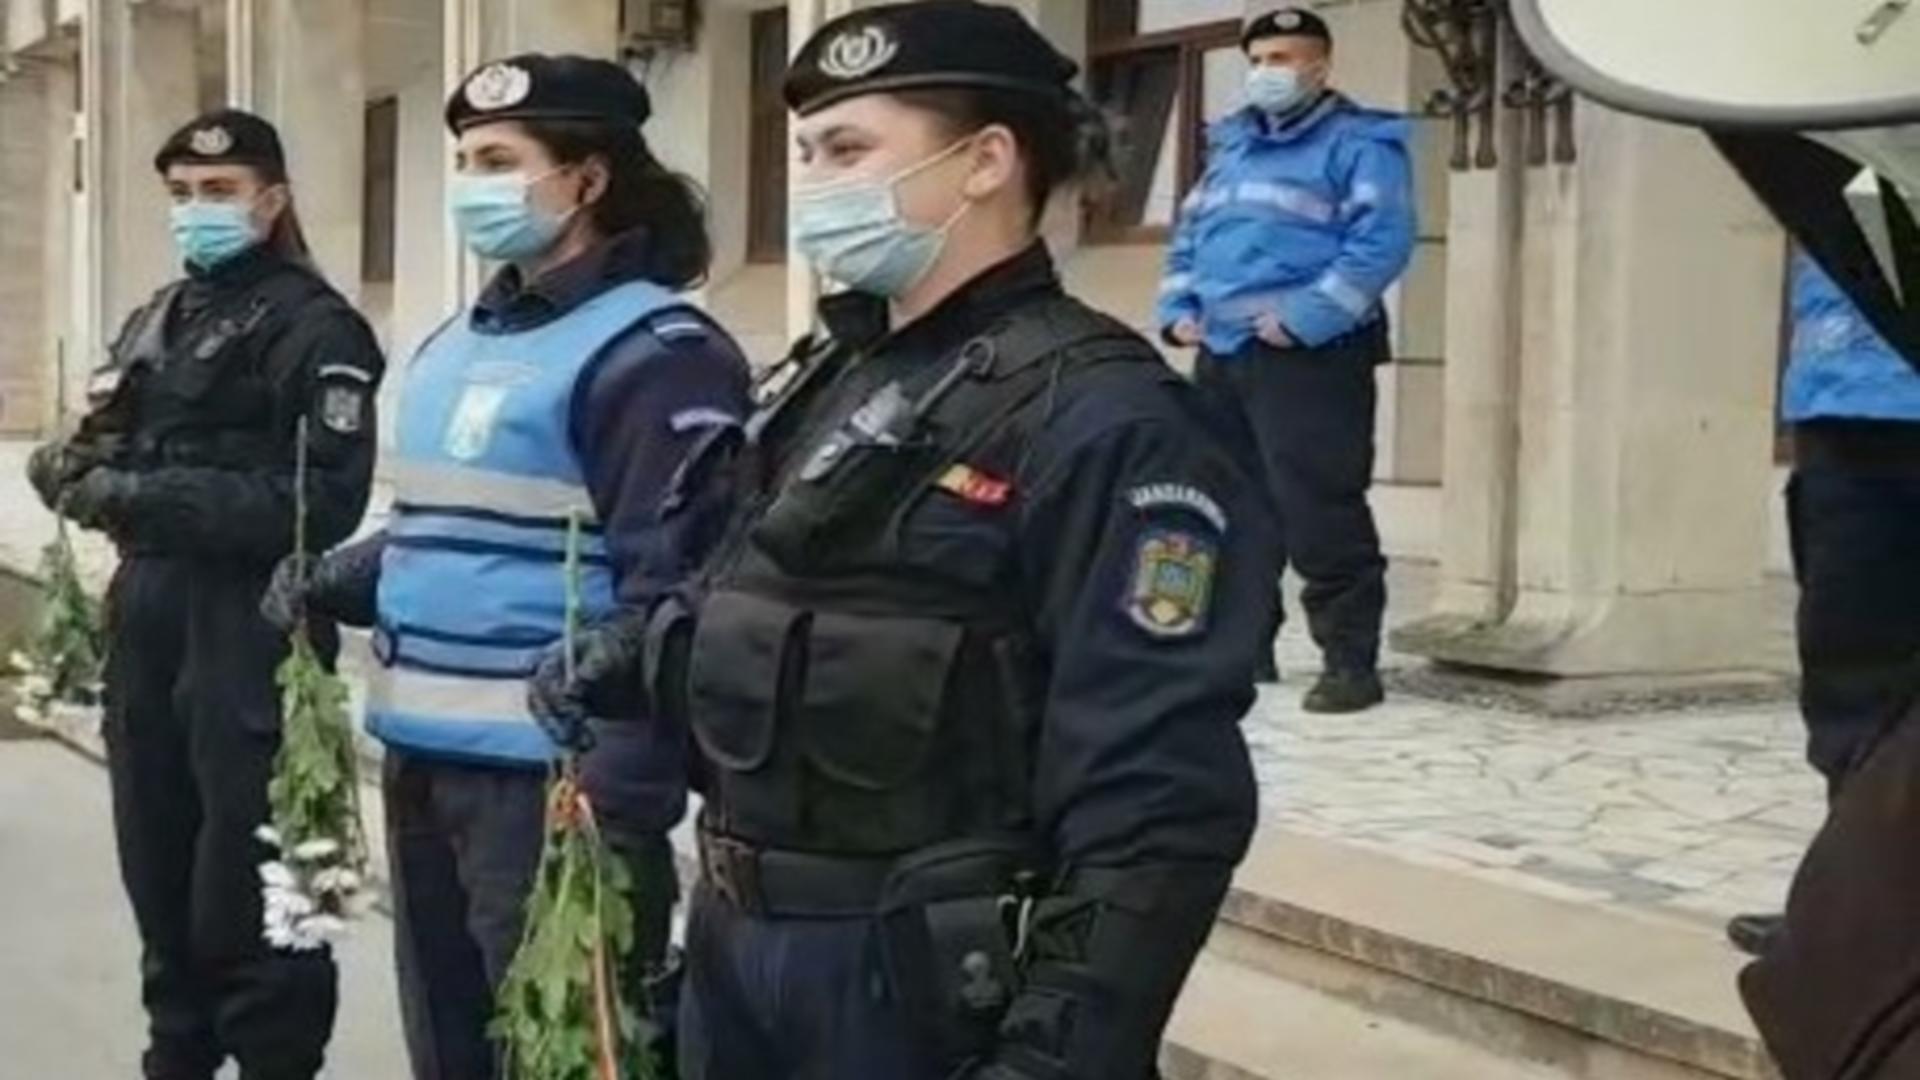 Femeile jandarm au primit flori de la protestatari, la Constanța